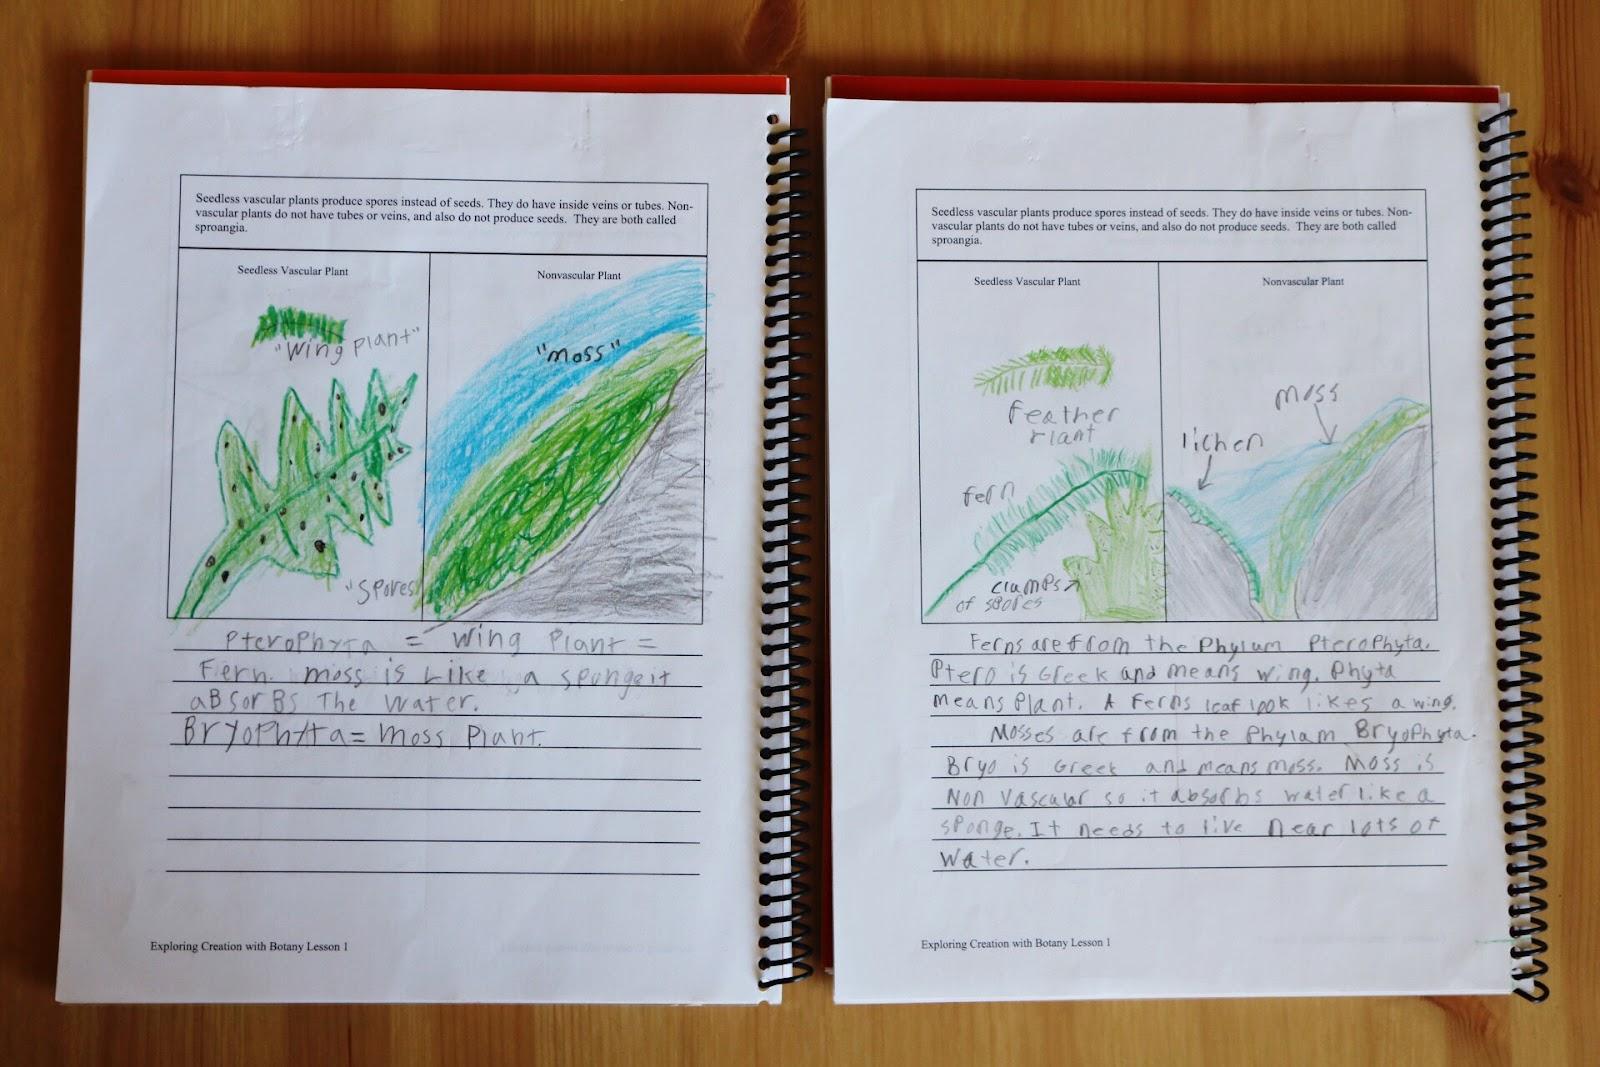 Botany Lab Report